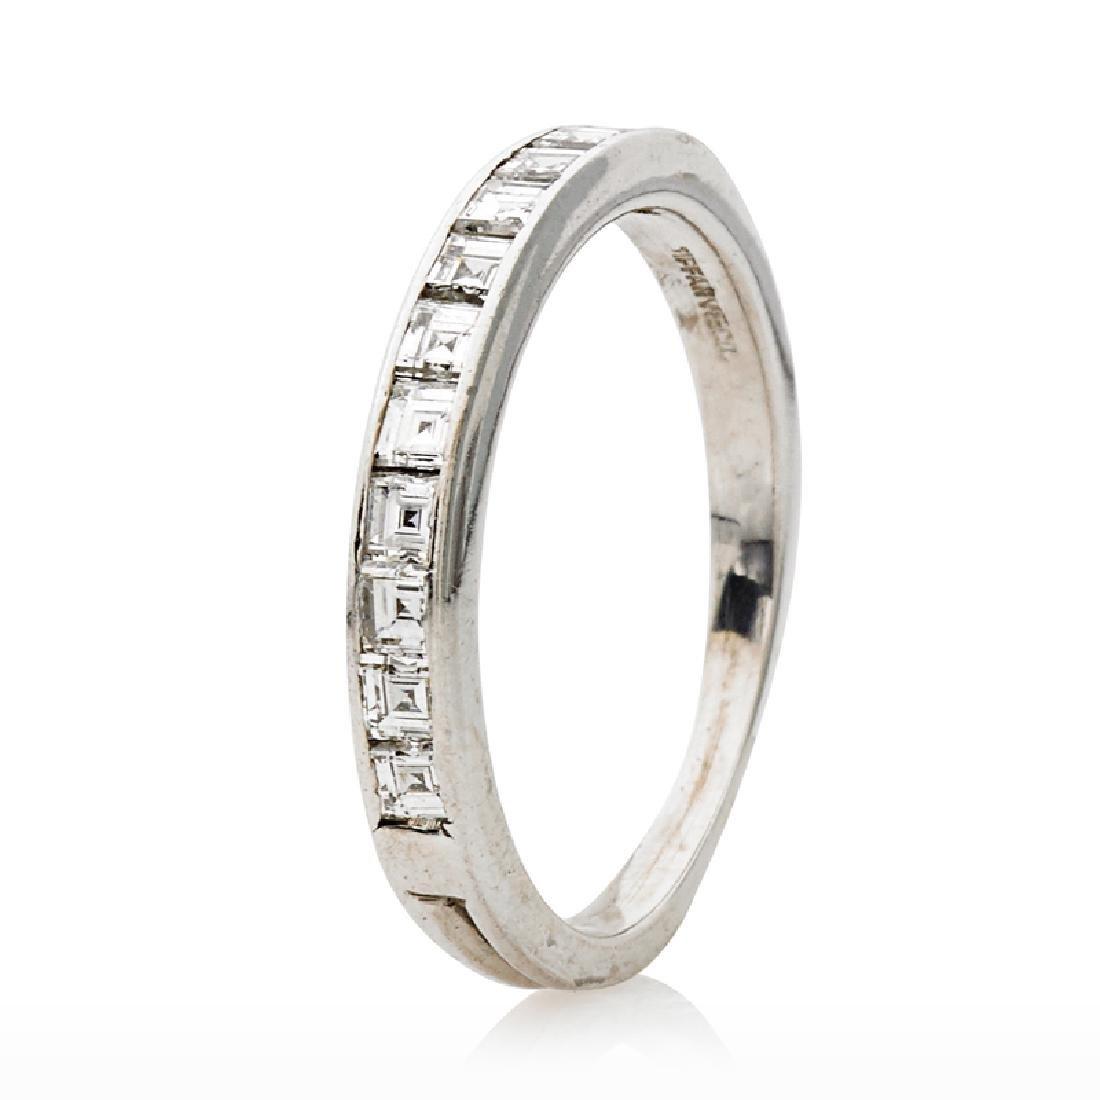 TIFFANY & CO. DIAMOND & PLATINUM ETERNITY BAND RING